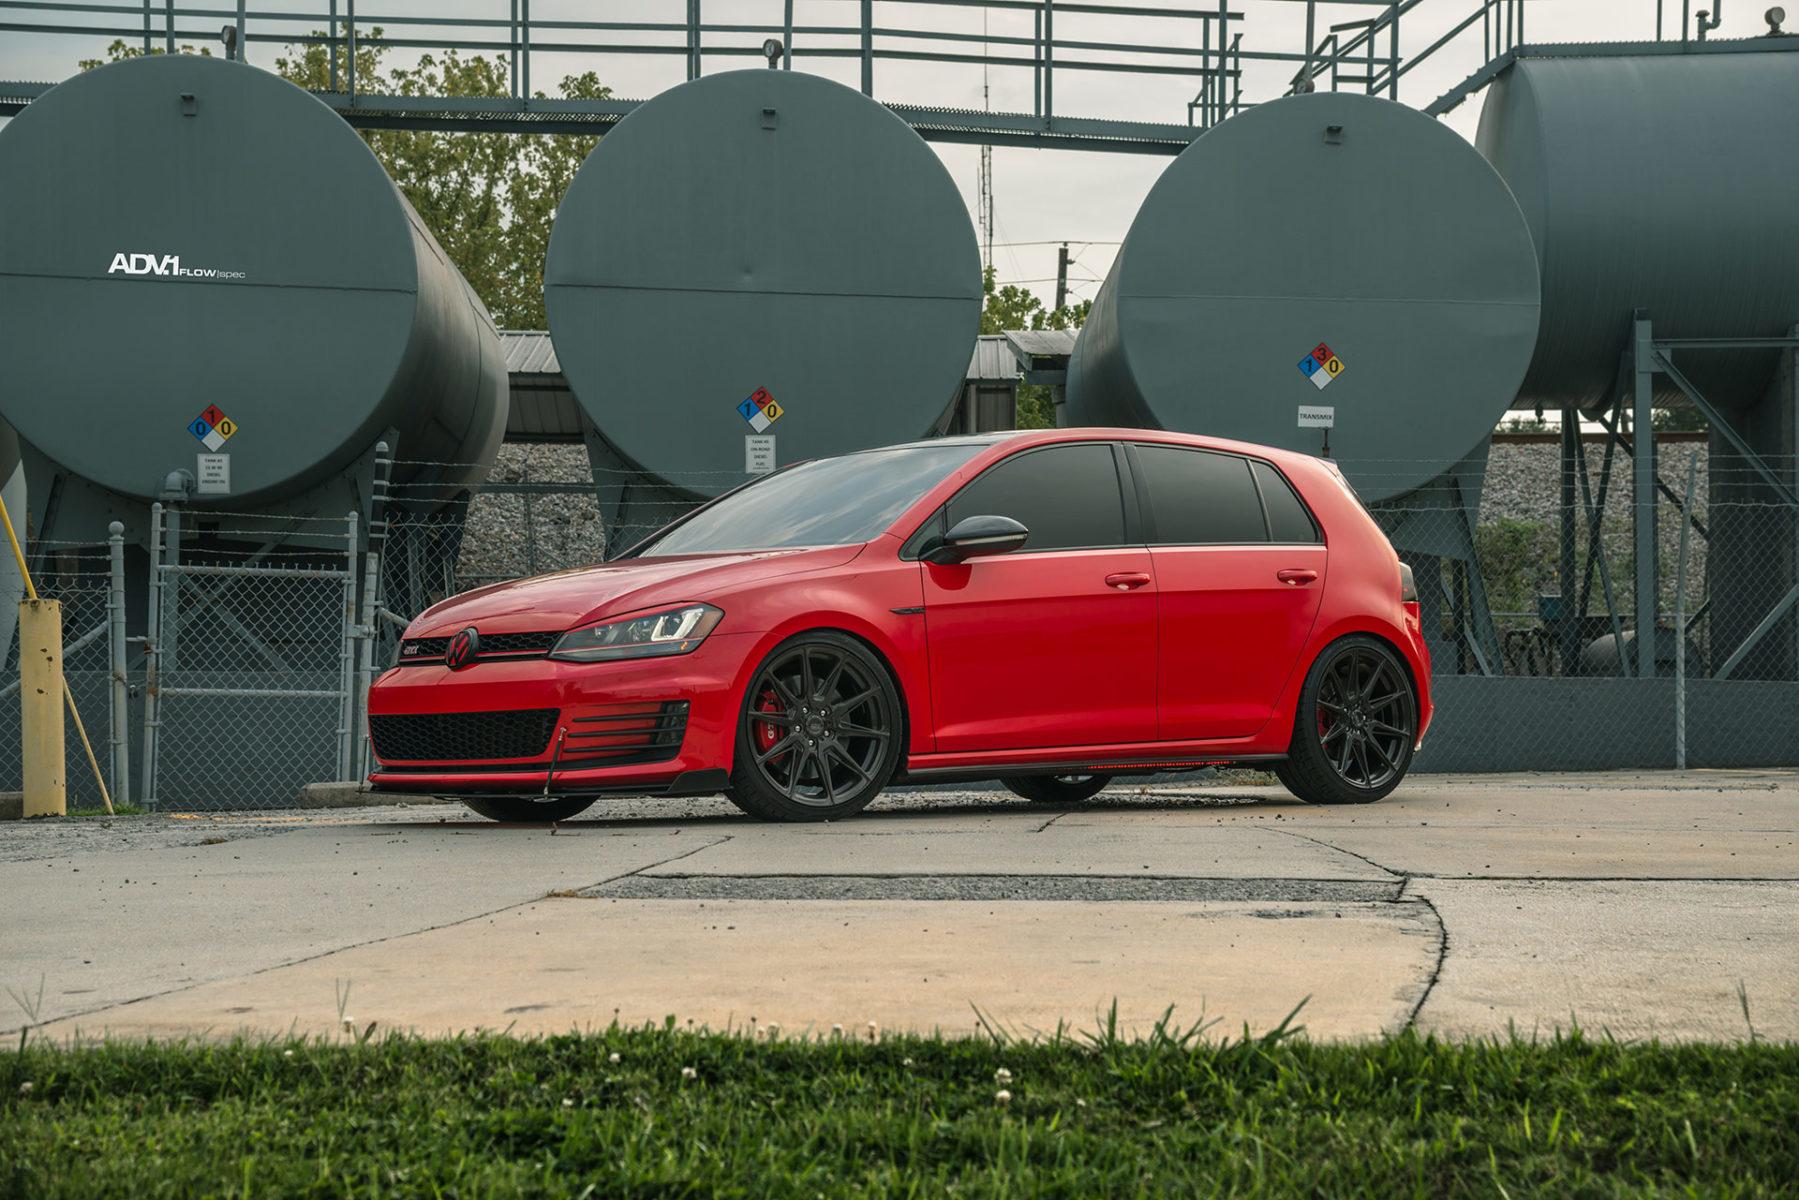 VW Golf MKVII GTi - ADV5.0 FLOWspec wheels in Liquid Brush Smoke